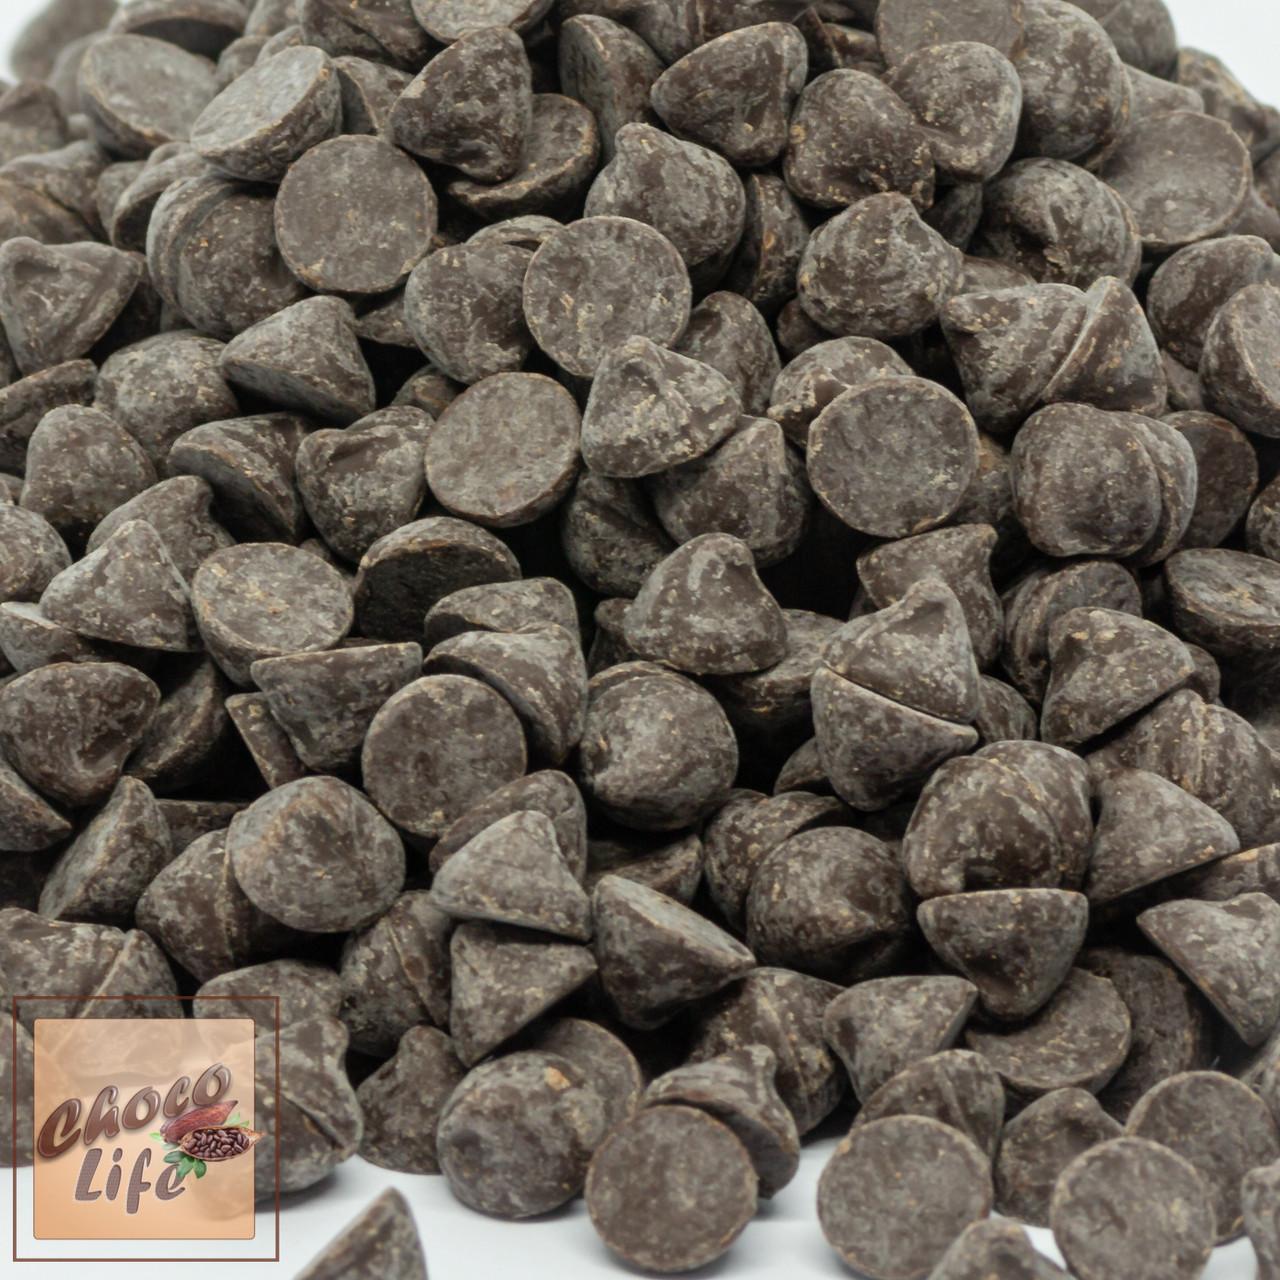 Чорний шоколад 71% 1кг Schokinag. Німеччина